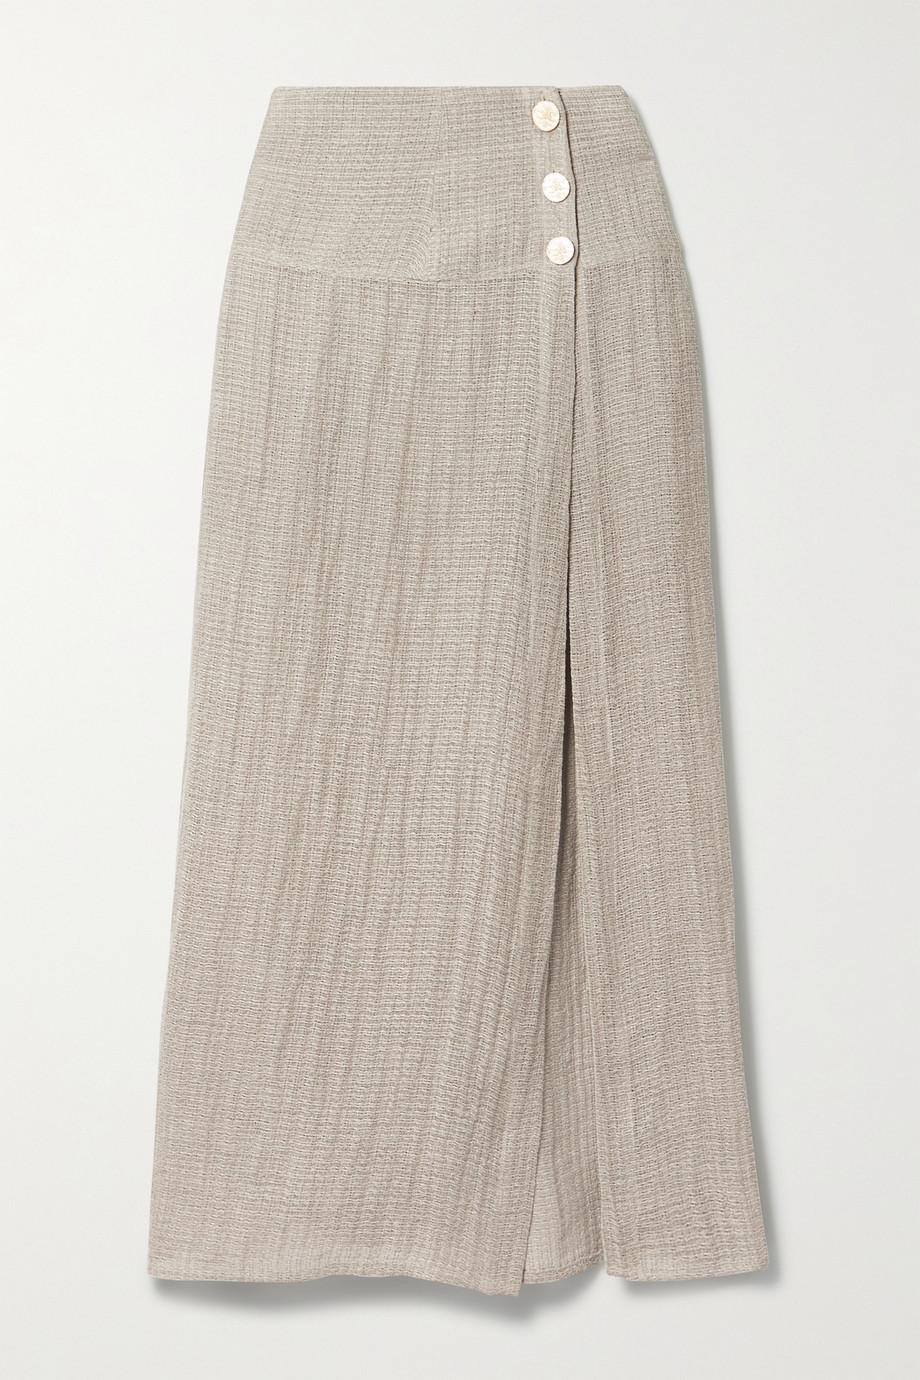 Le Kasha + NET SUSTAIN Haifa organic linen-gauze maxi skirt